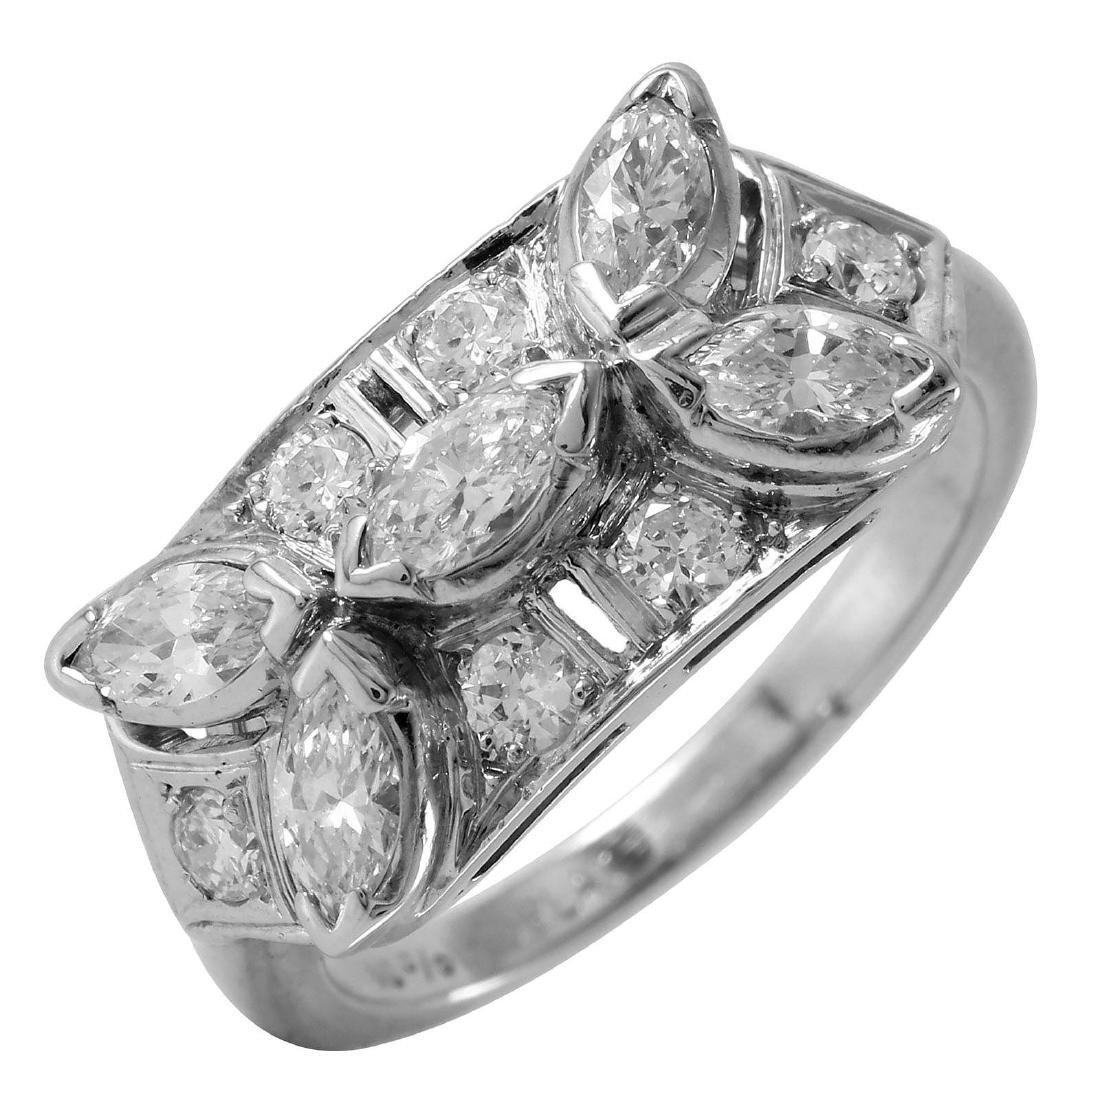 Platinum 1.60ctw Vintage Marquise Diamond Cocktail Ring